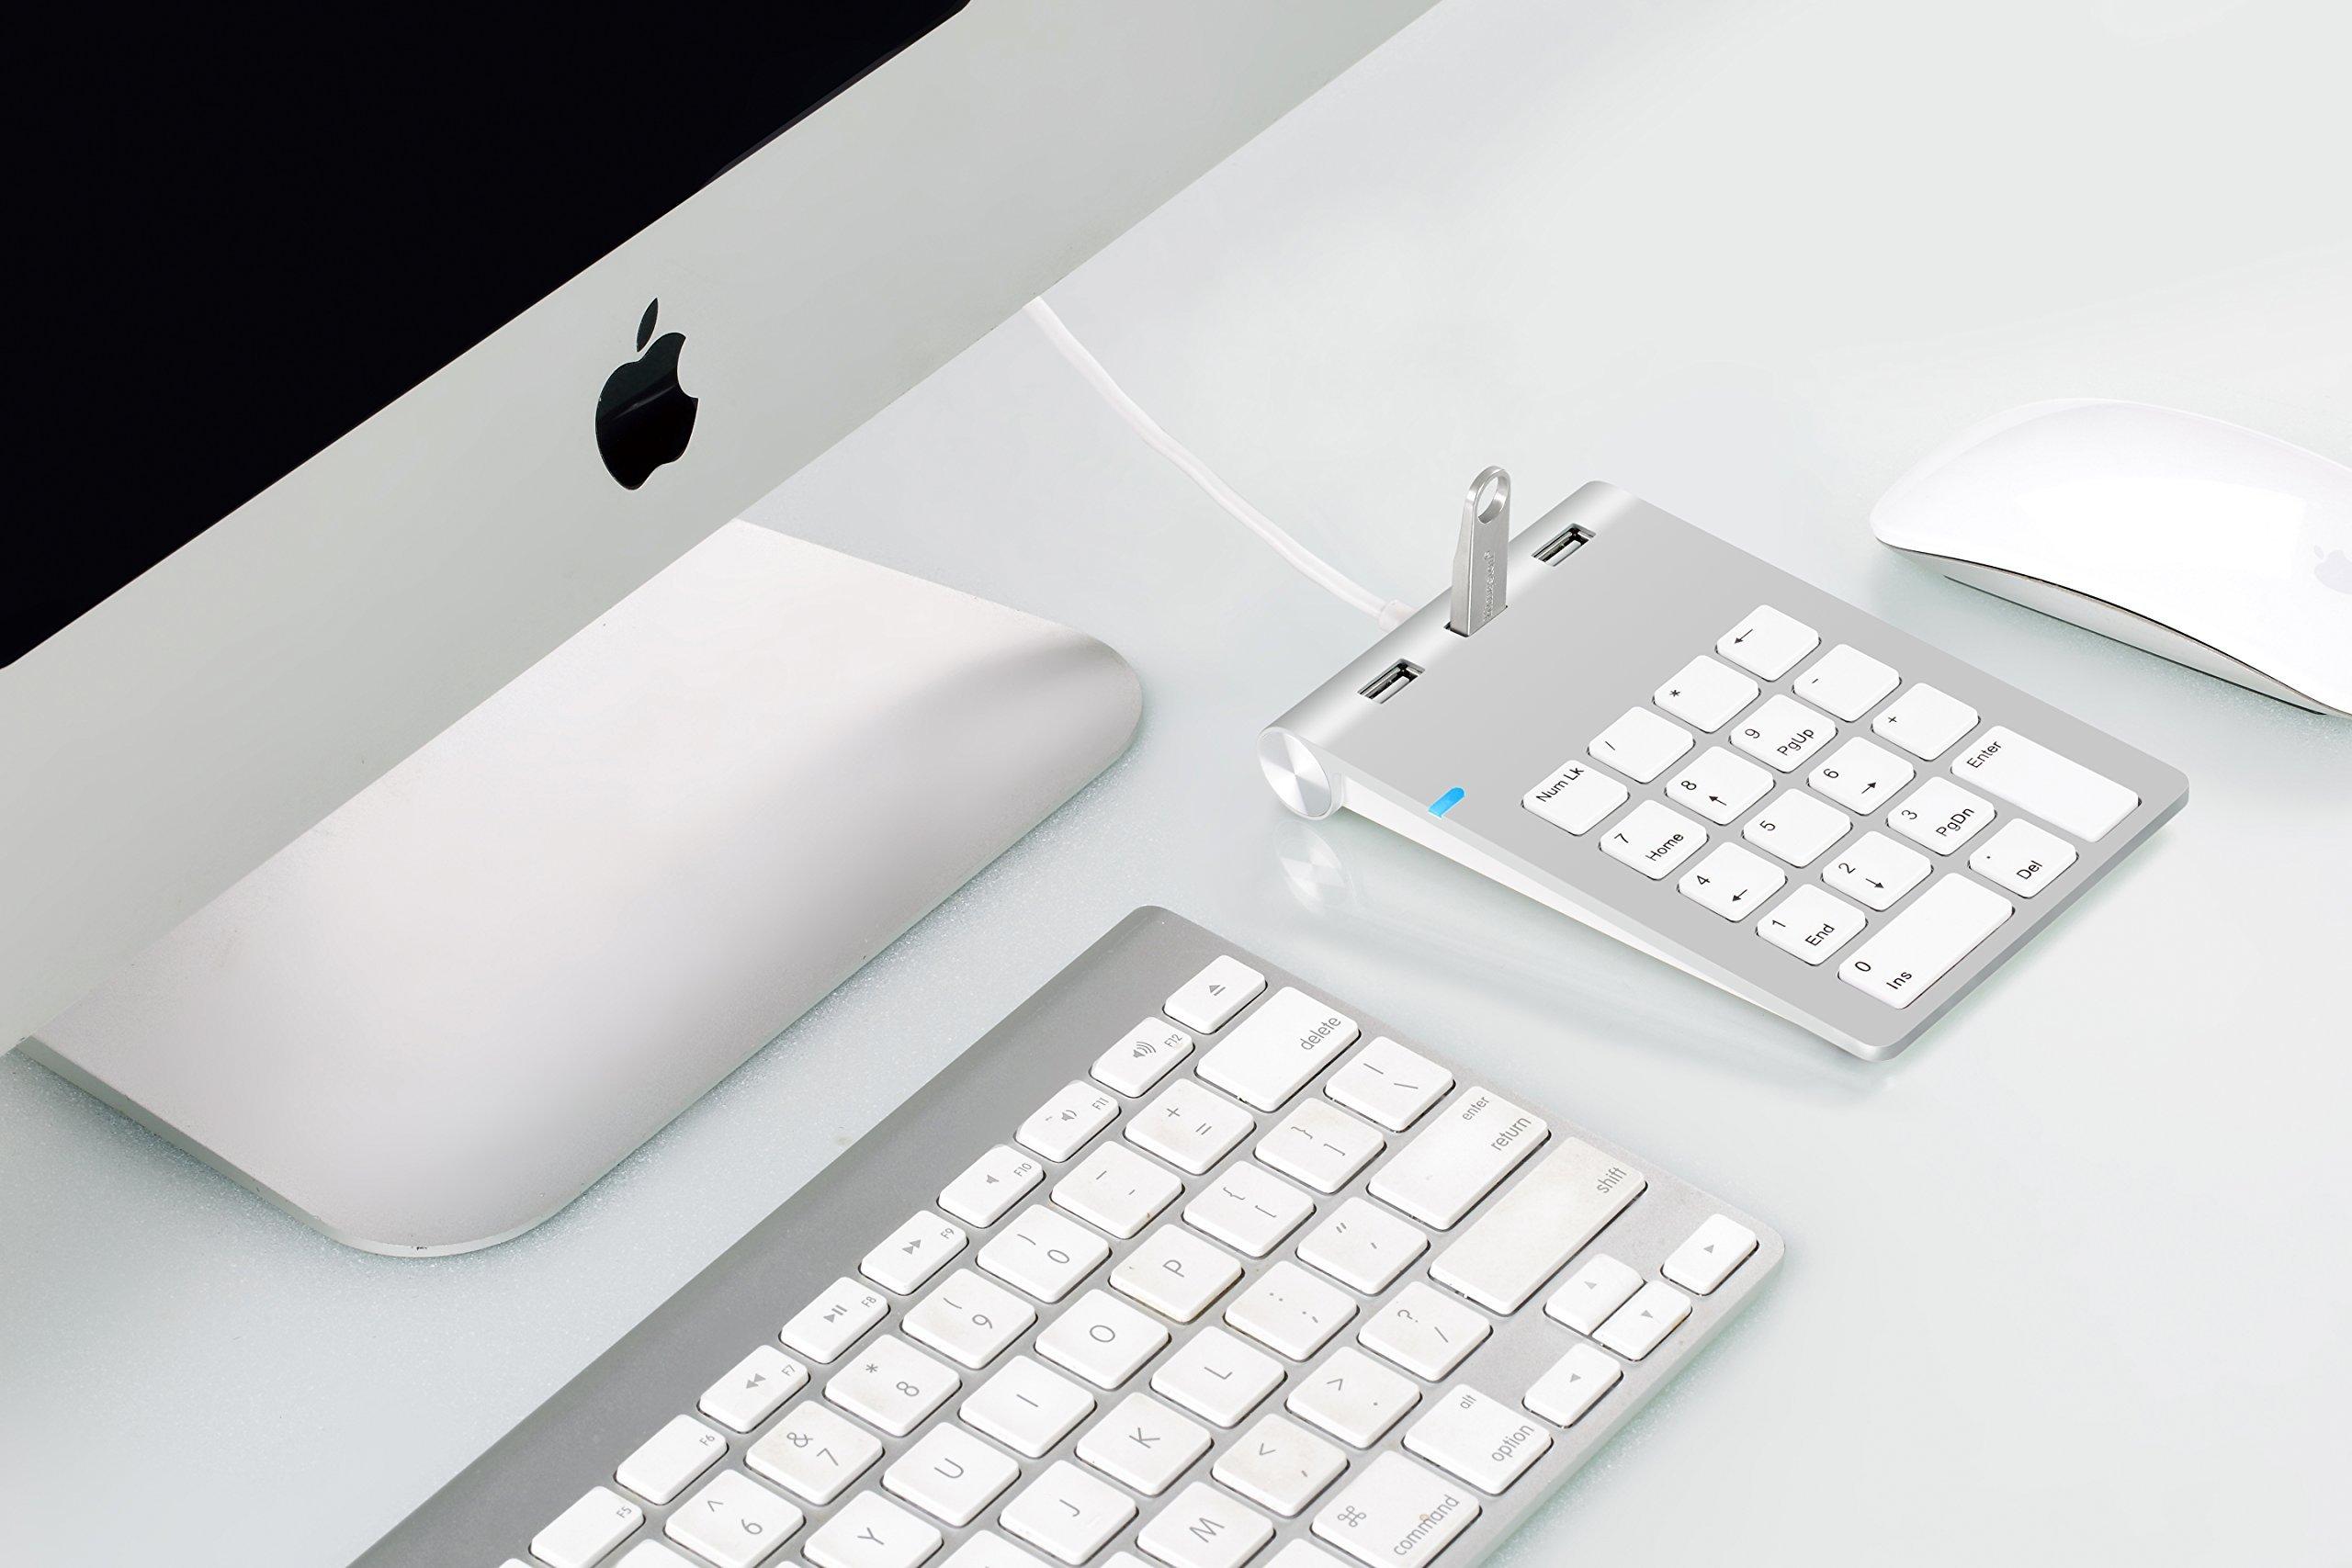 Cateck Aluminum Finish USB Numeric Keypad with USB Hub Combo for iMac, MacBooks, PCs and Laptops